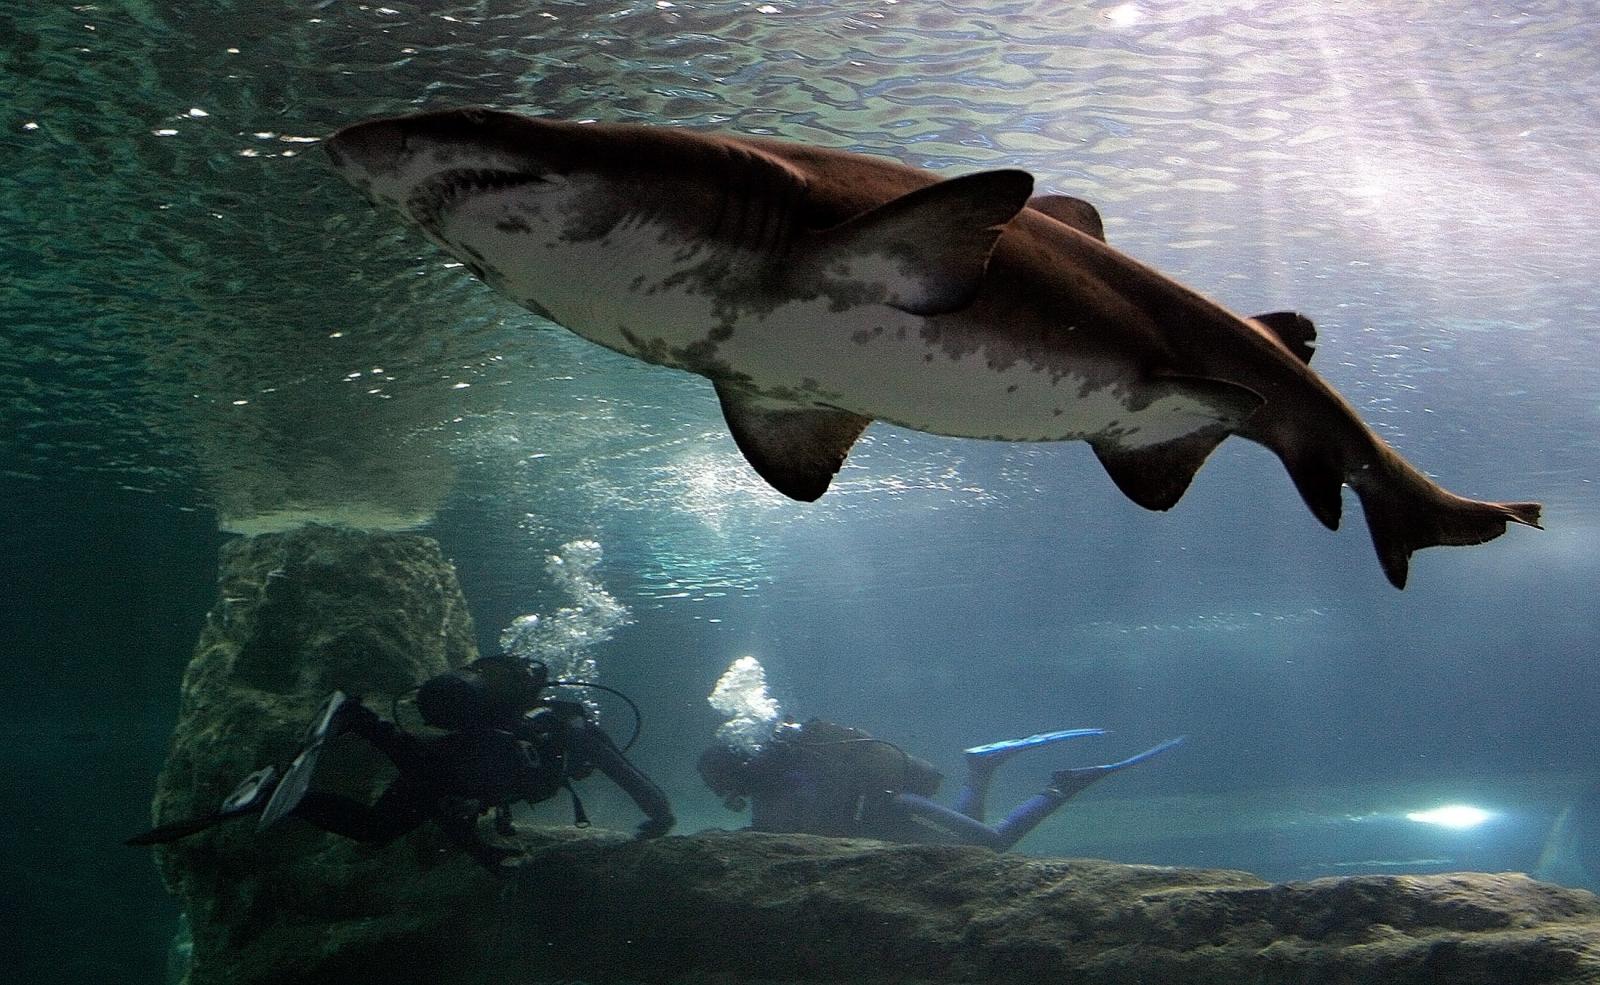 Amazoncom Blankie Tails Shark Blanket Gray and Deep